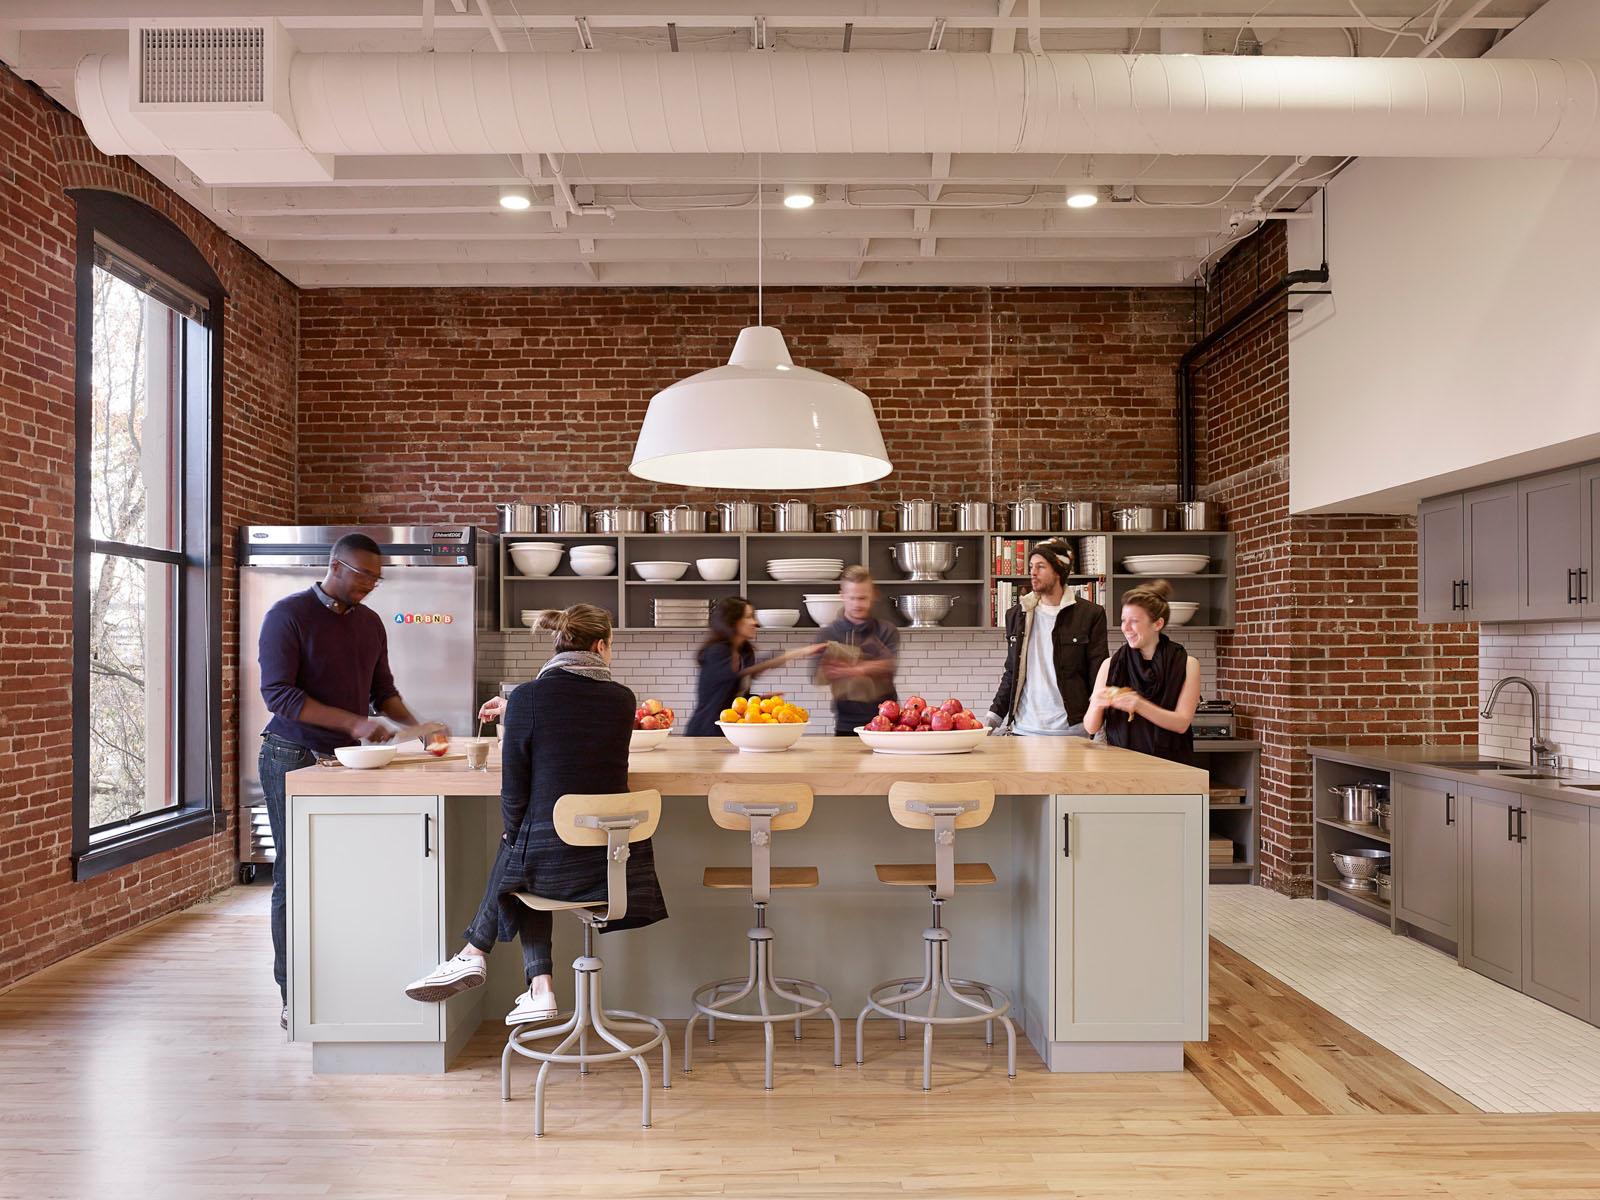 bora_kitchen.jpg